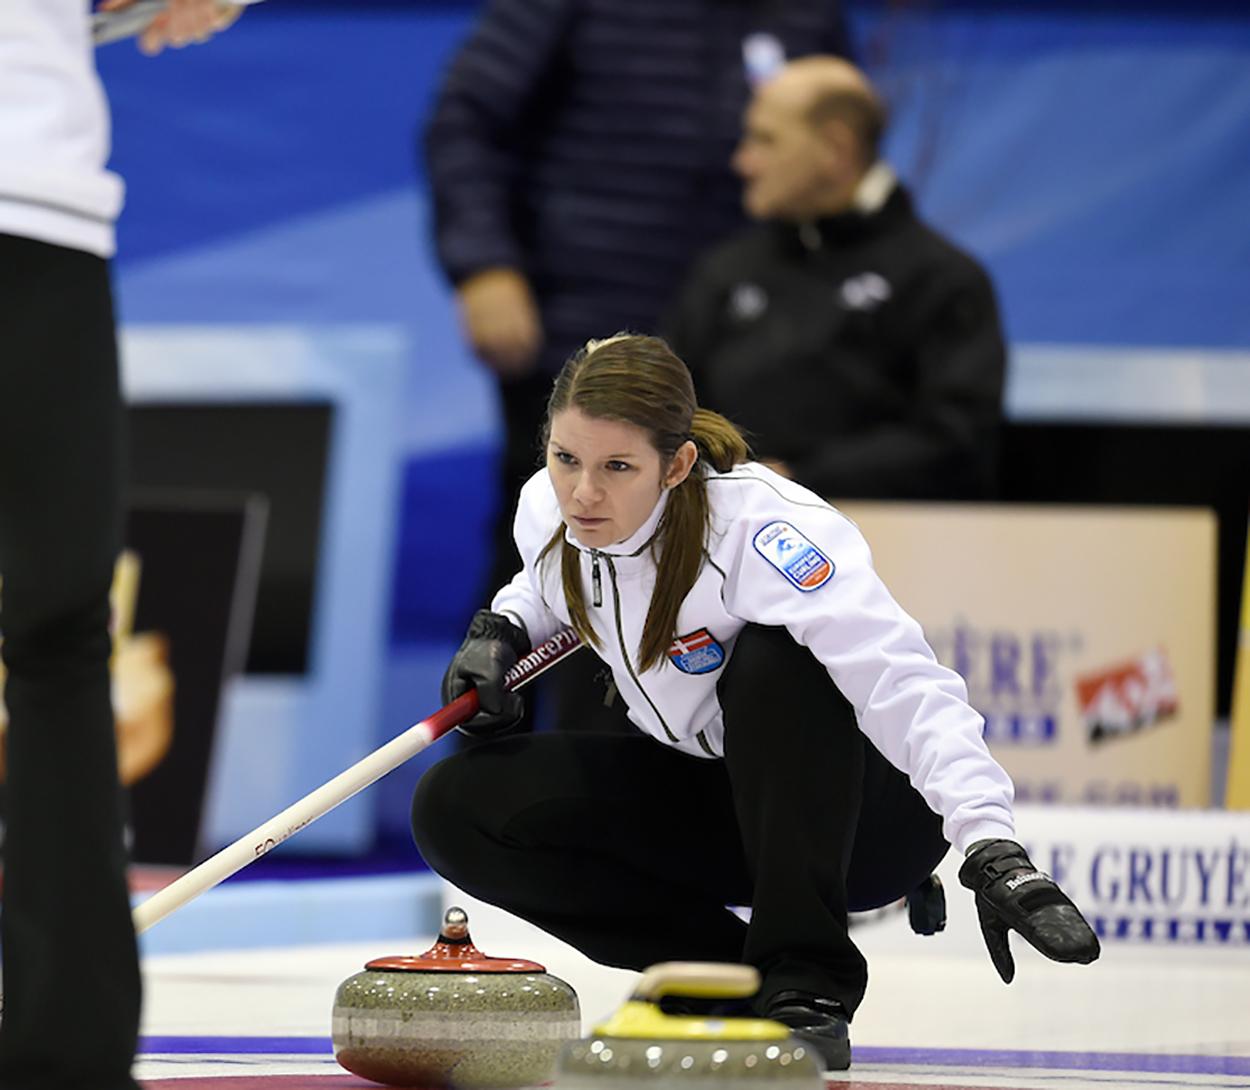 EM Curling 2015